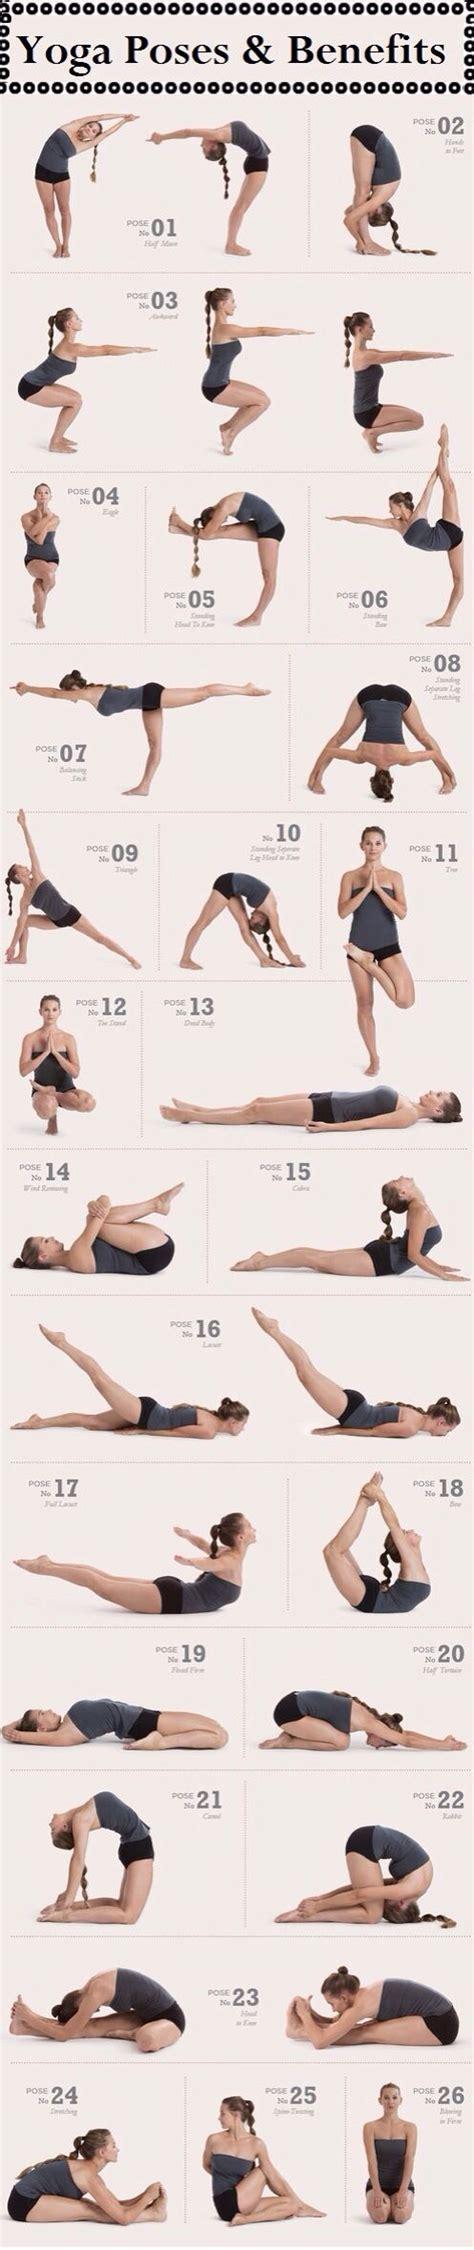 tutorial bikram yoga http musclebuildingstrengthtraining blogspot com on